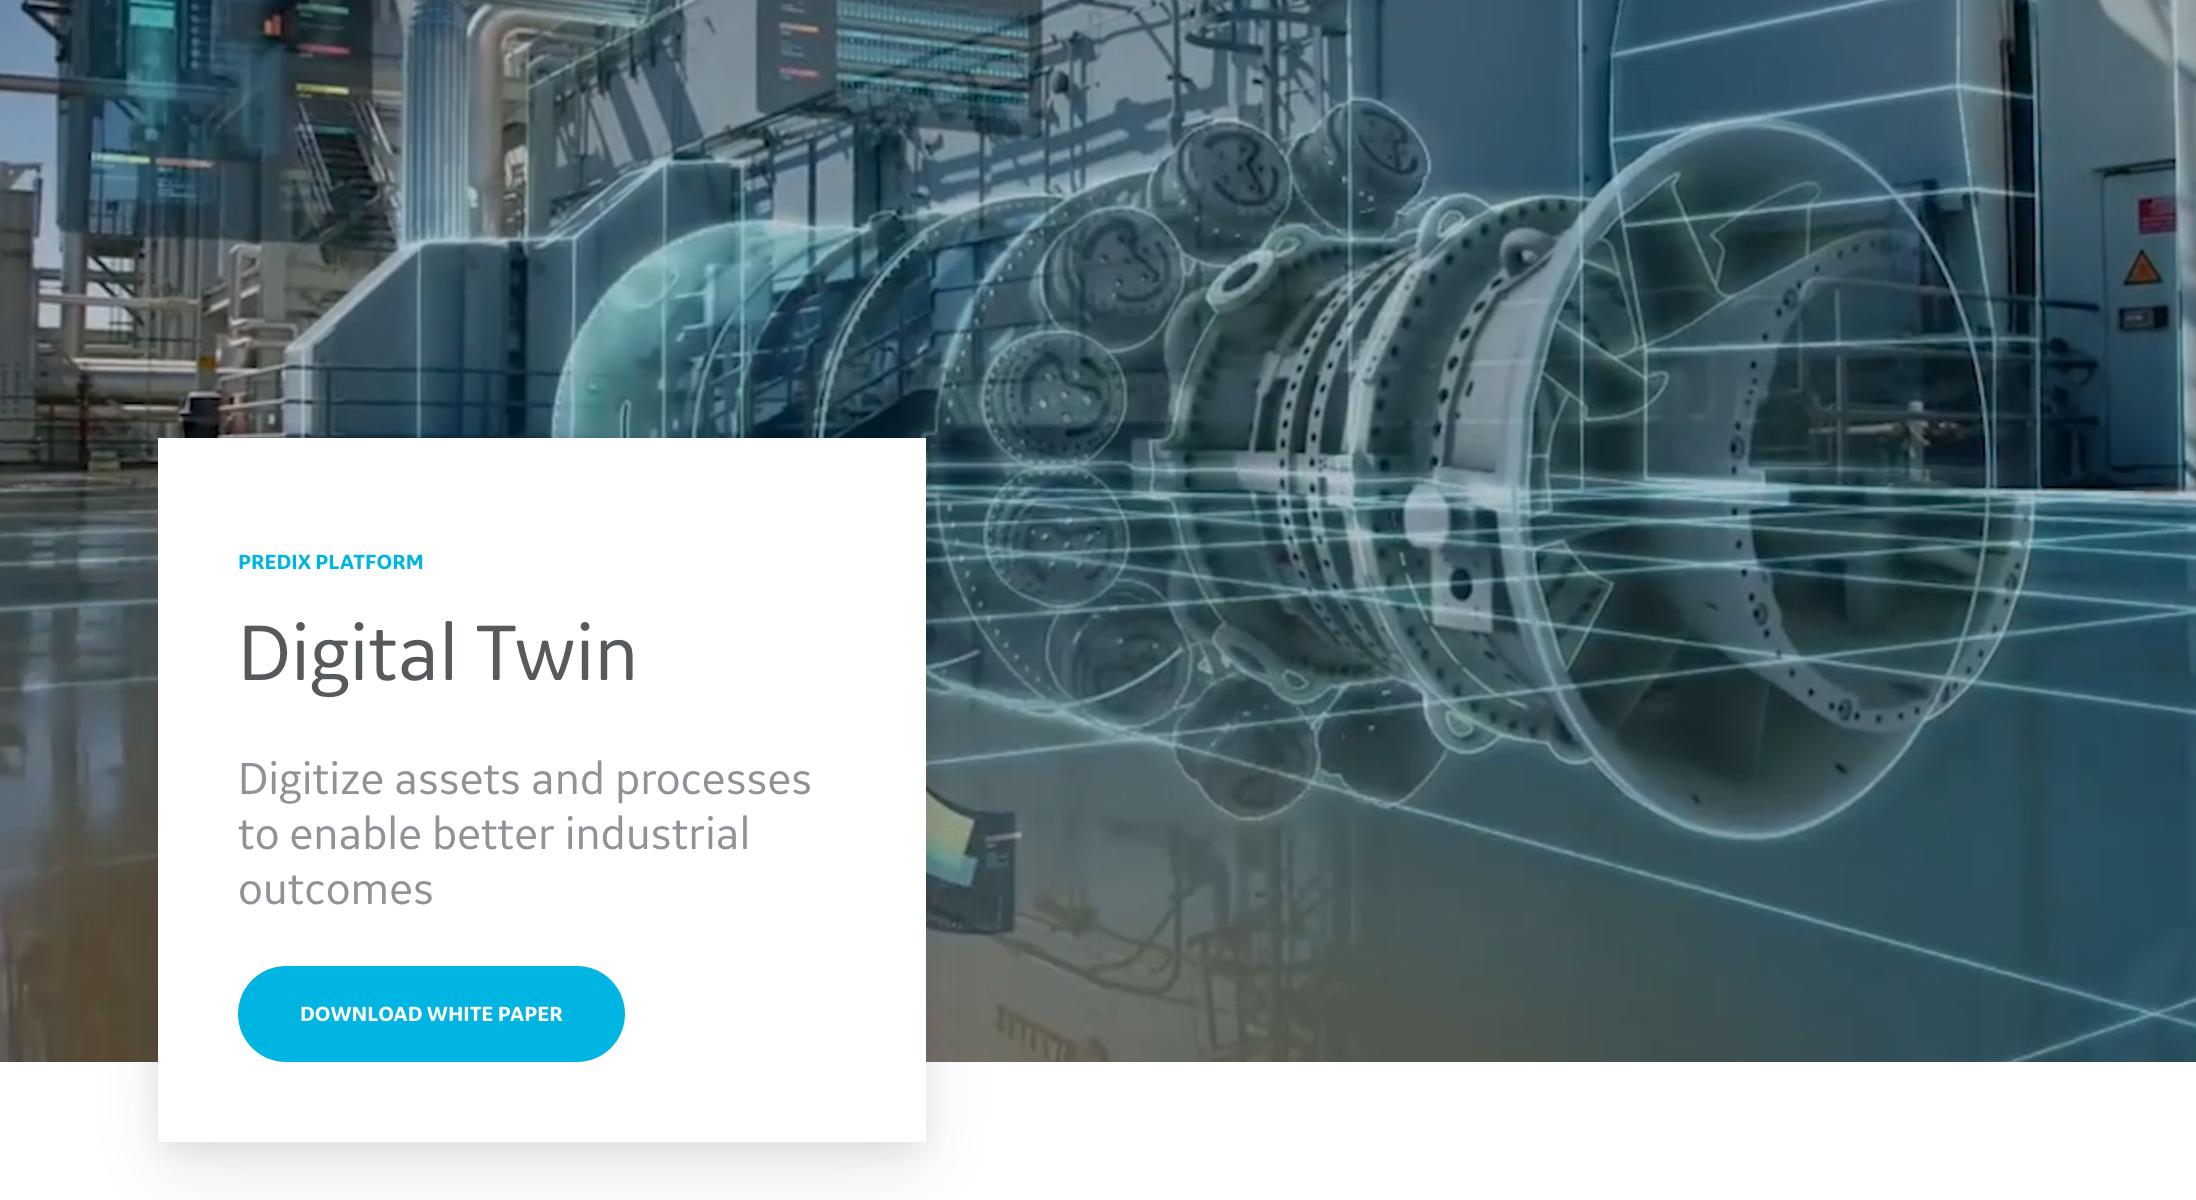 digital-twin-screenshot.png